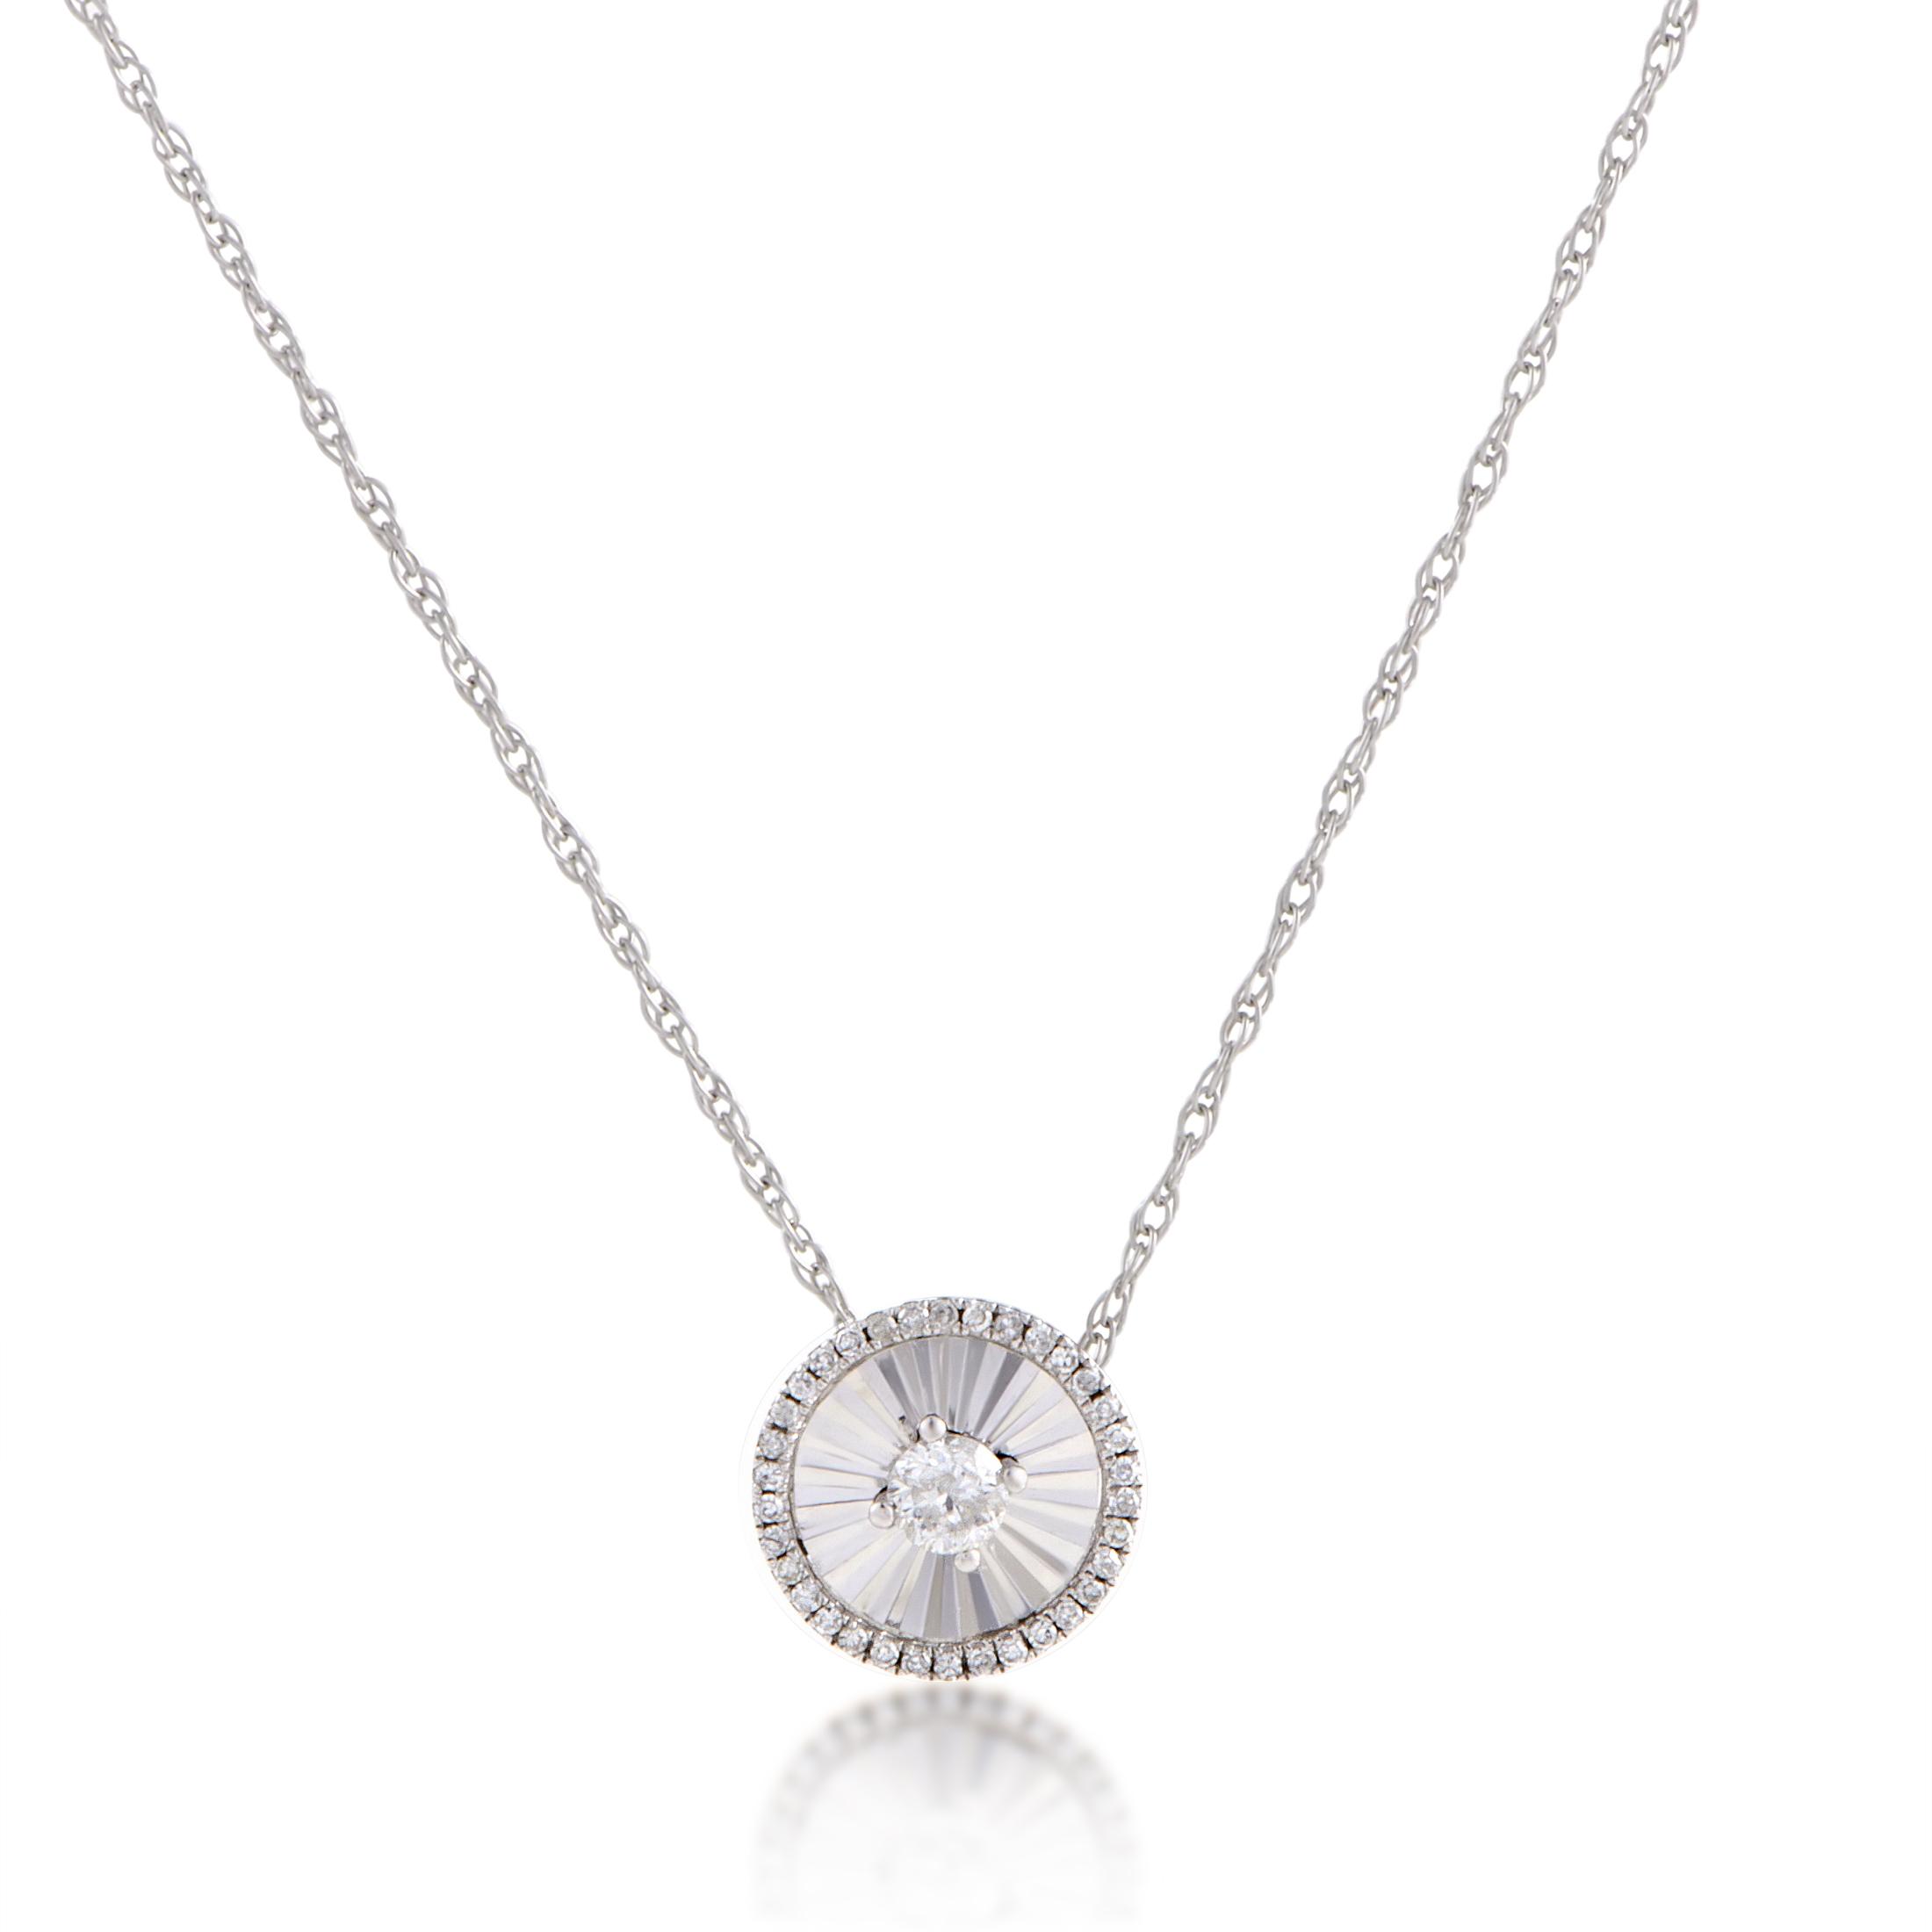 necklaces 14k white gold diamond small round pendant. Black Bedroom Furniture Sets. Home Design Ideas